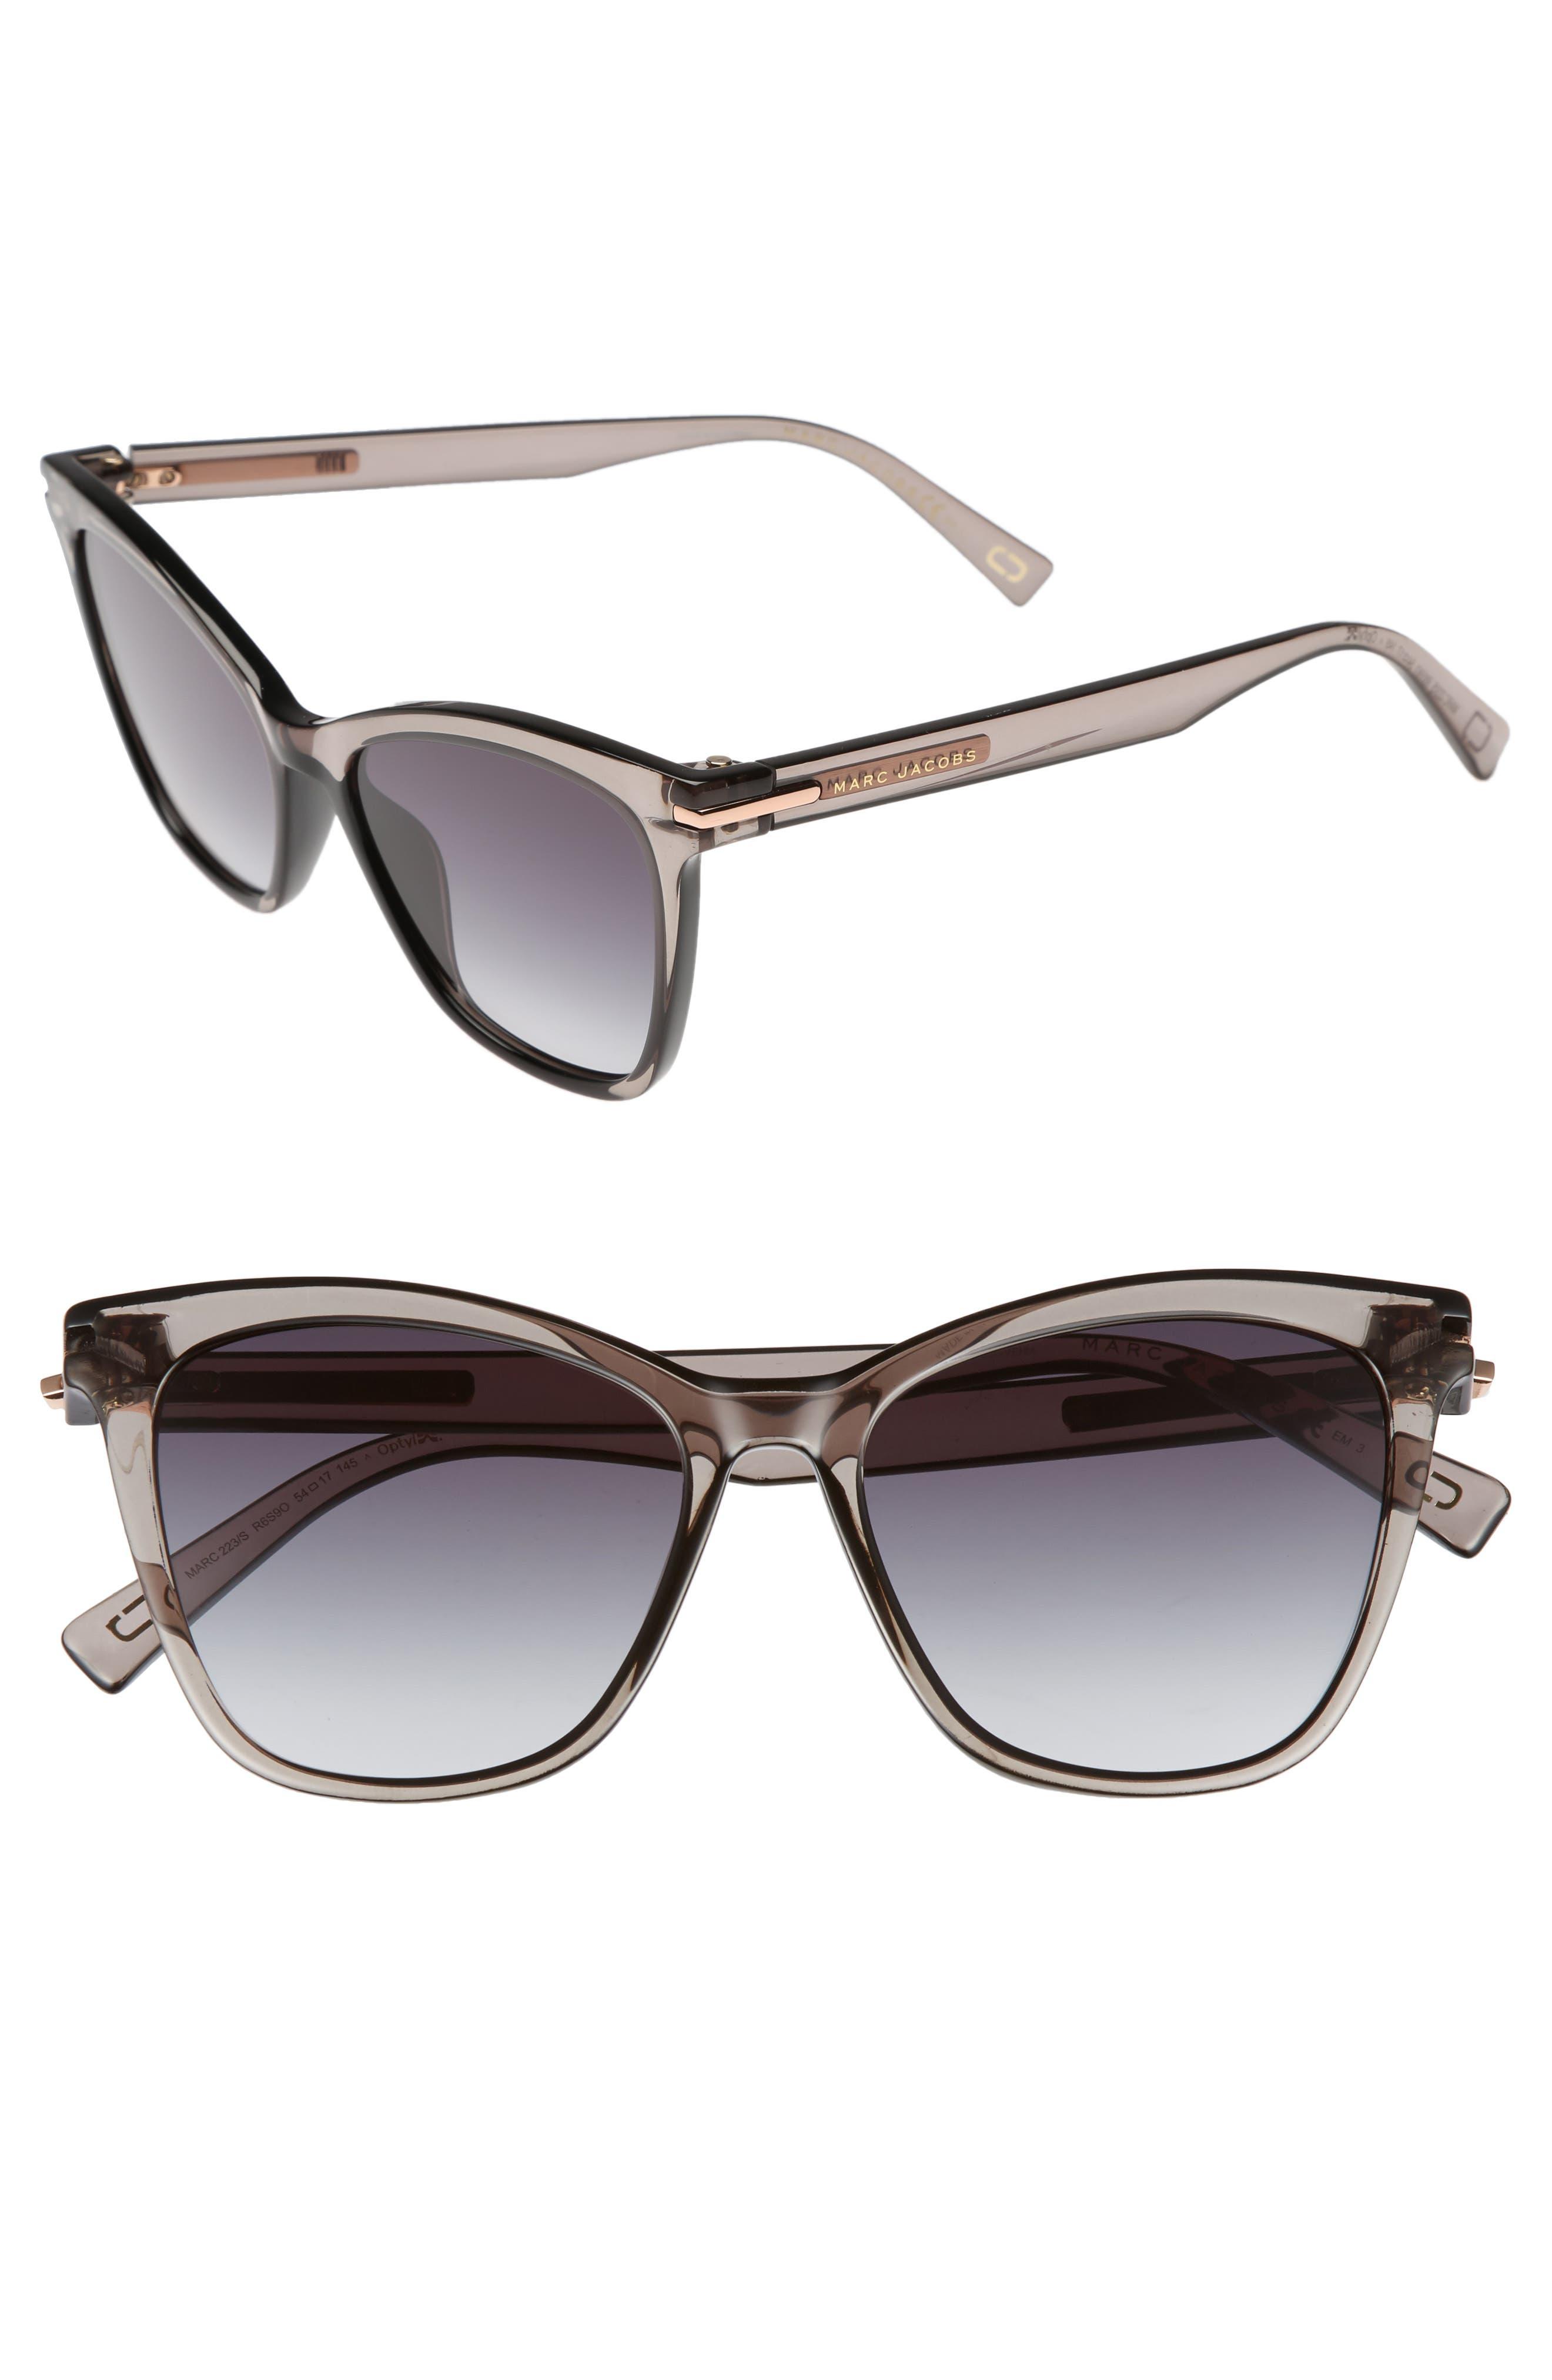 54a6183ab0 MARC JACOBS 54Mm Gradient Lens Sunglasses - Grey  Black